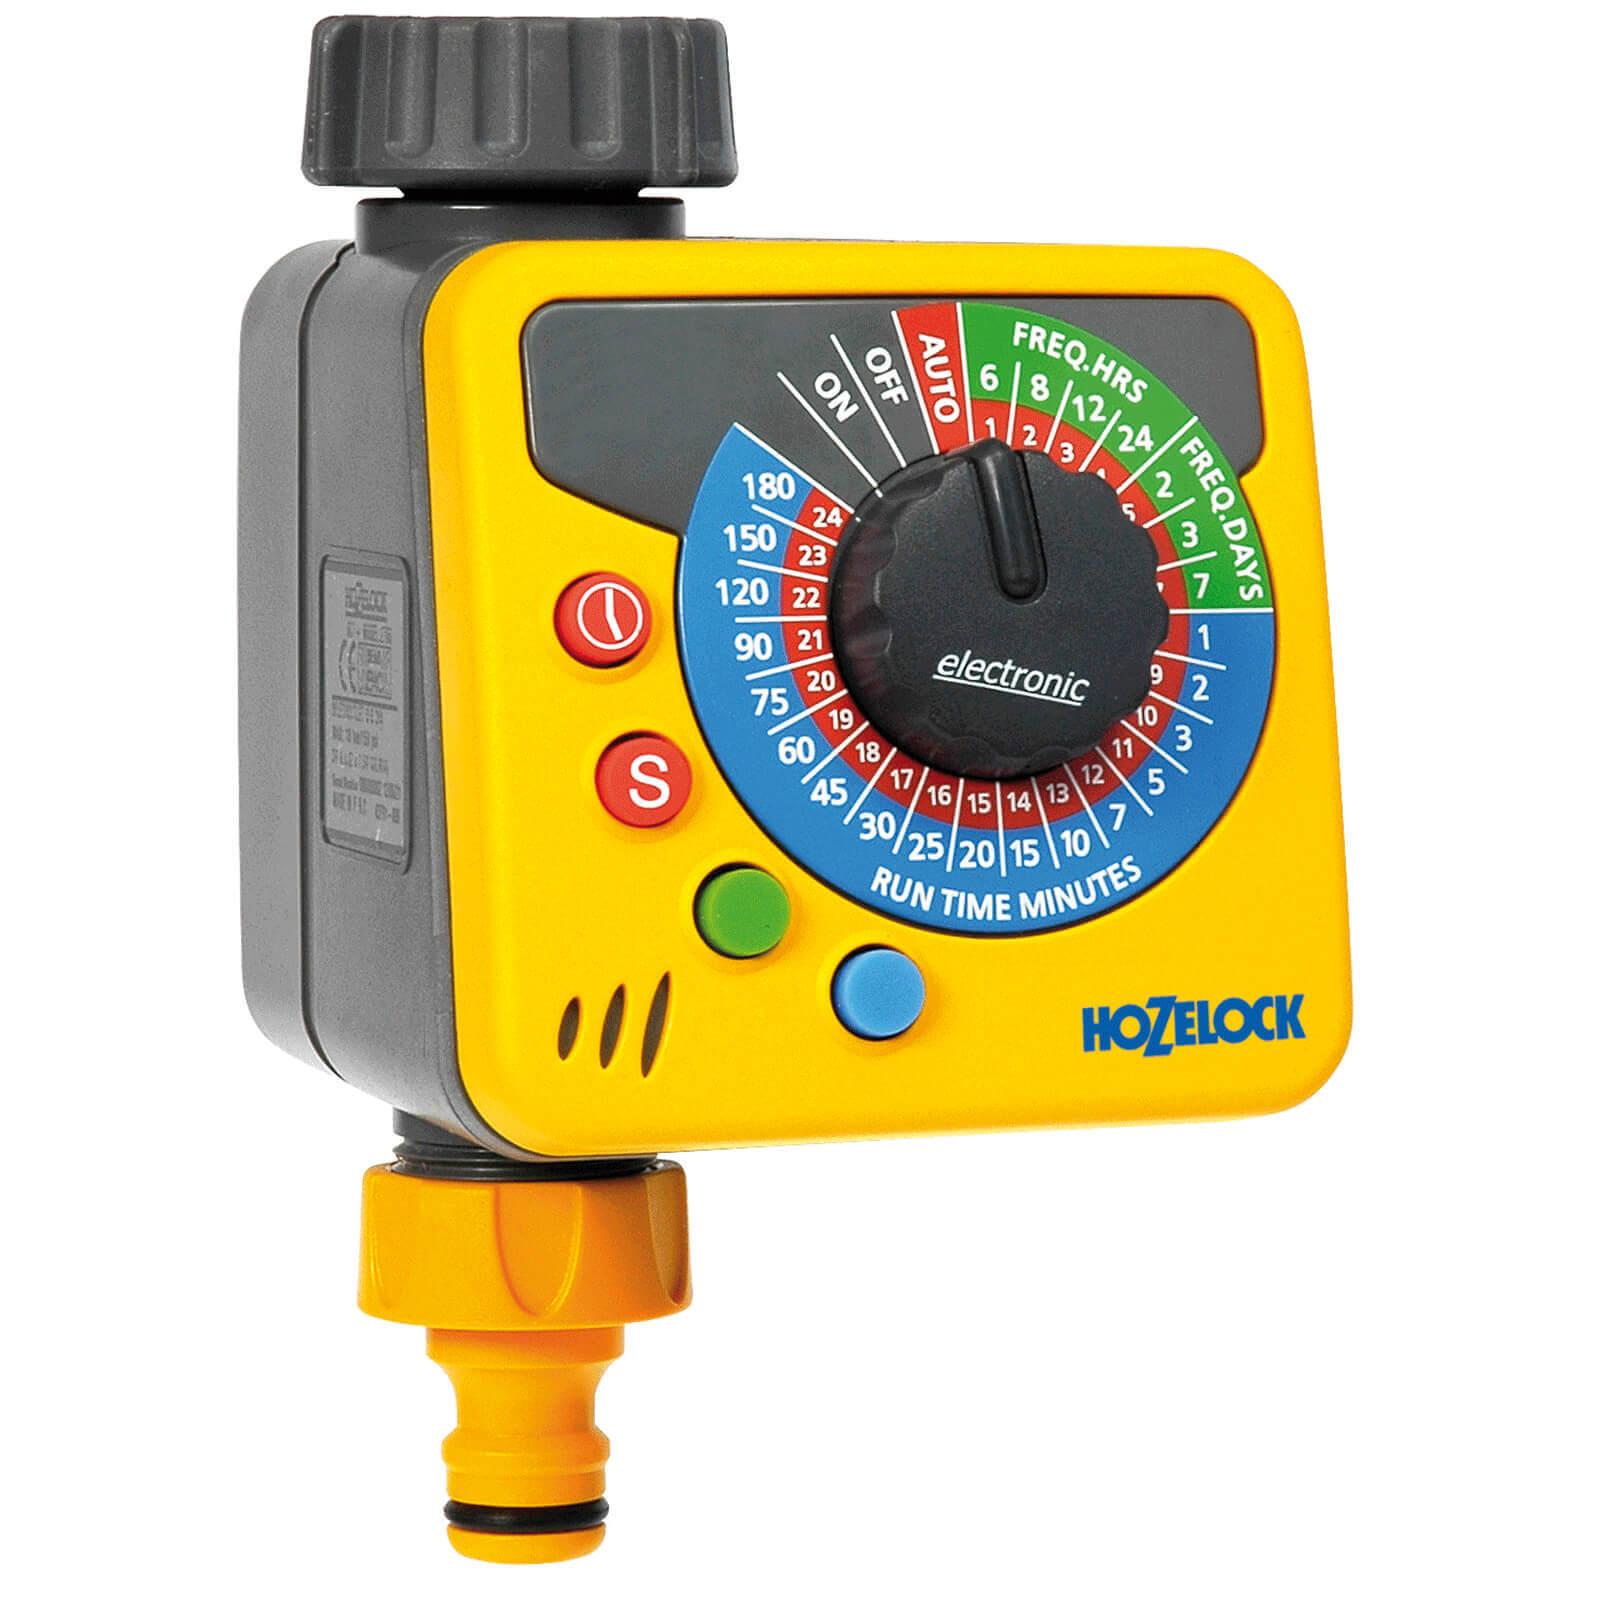 Image of Hozelock Aqua Control PLUS Water Timer